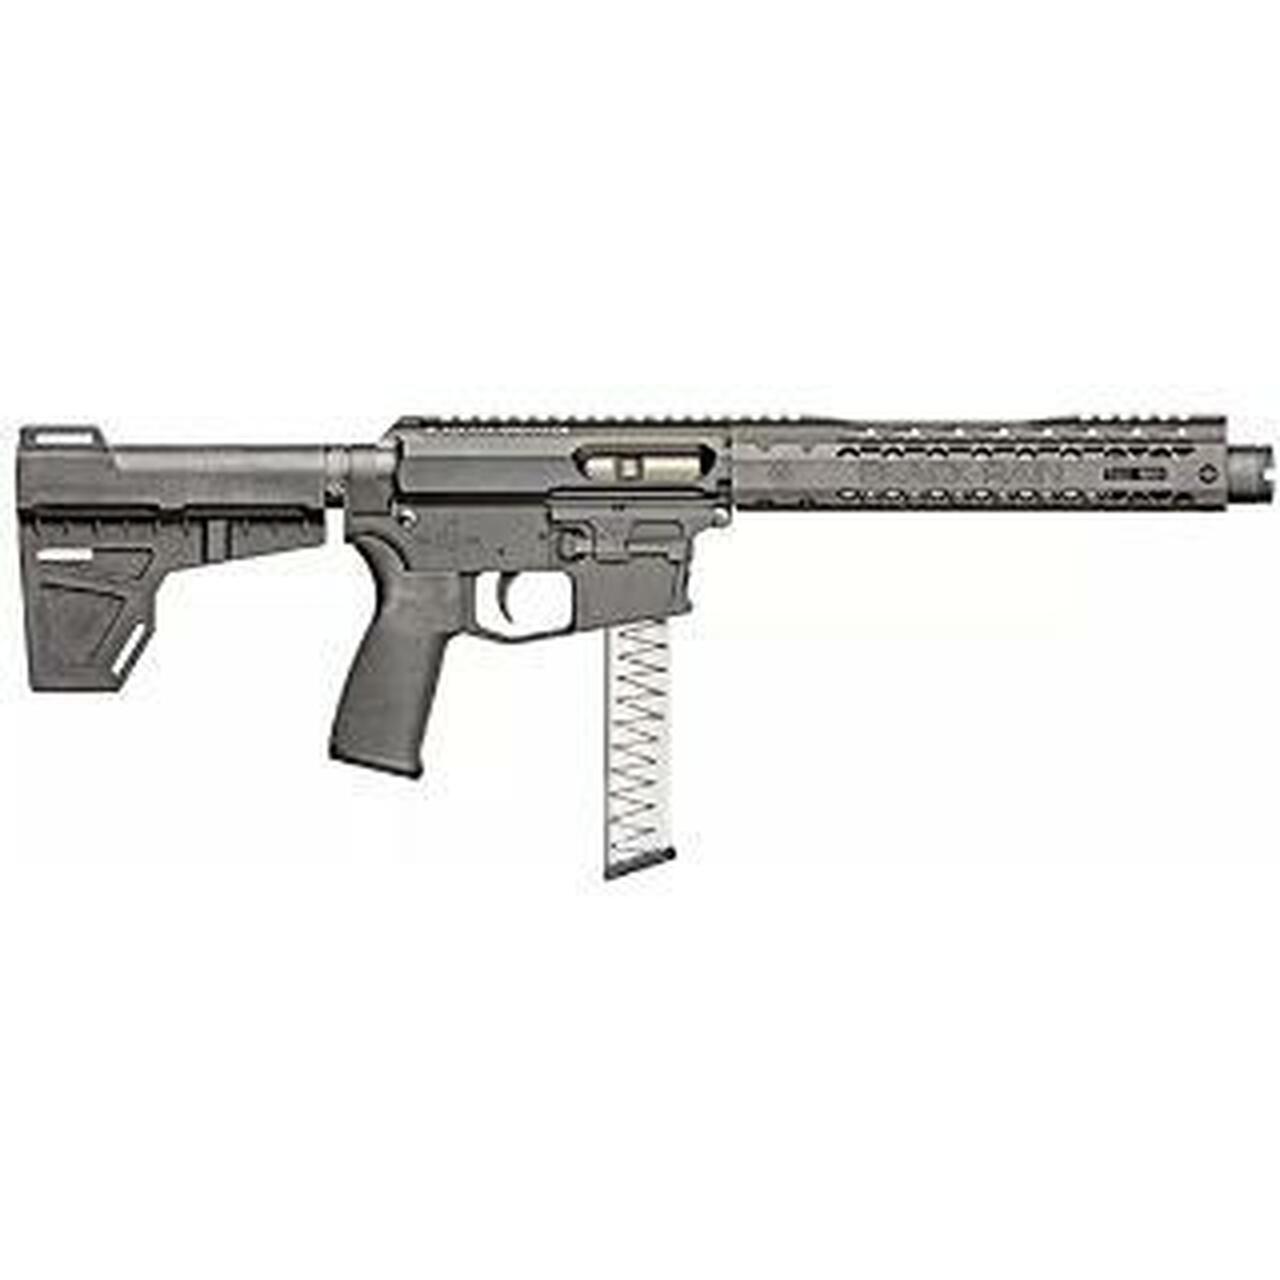 "Image of Black Rain ION 9 AR-15 Pistol, 9mm, 8.75"" Barrel, KAK Shockwave Blade Brace, Glock Magazine"